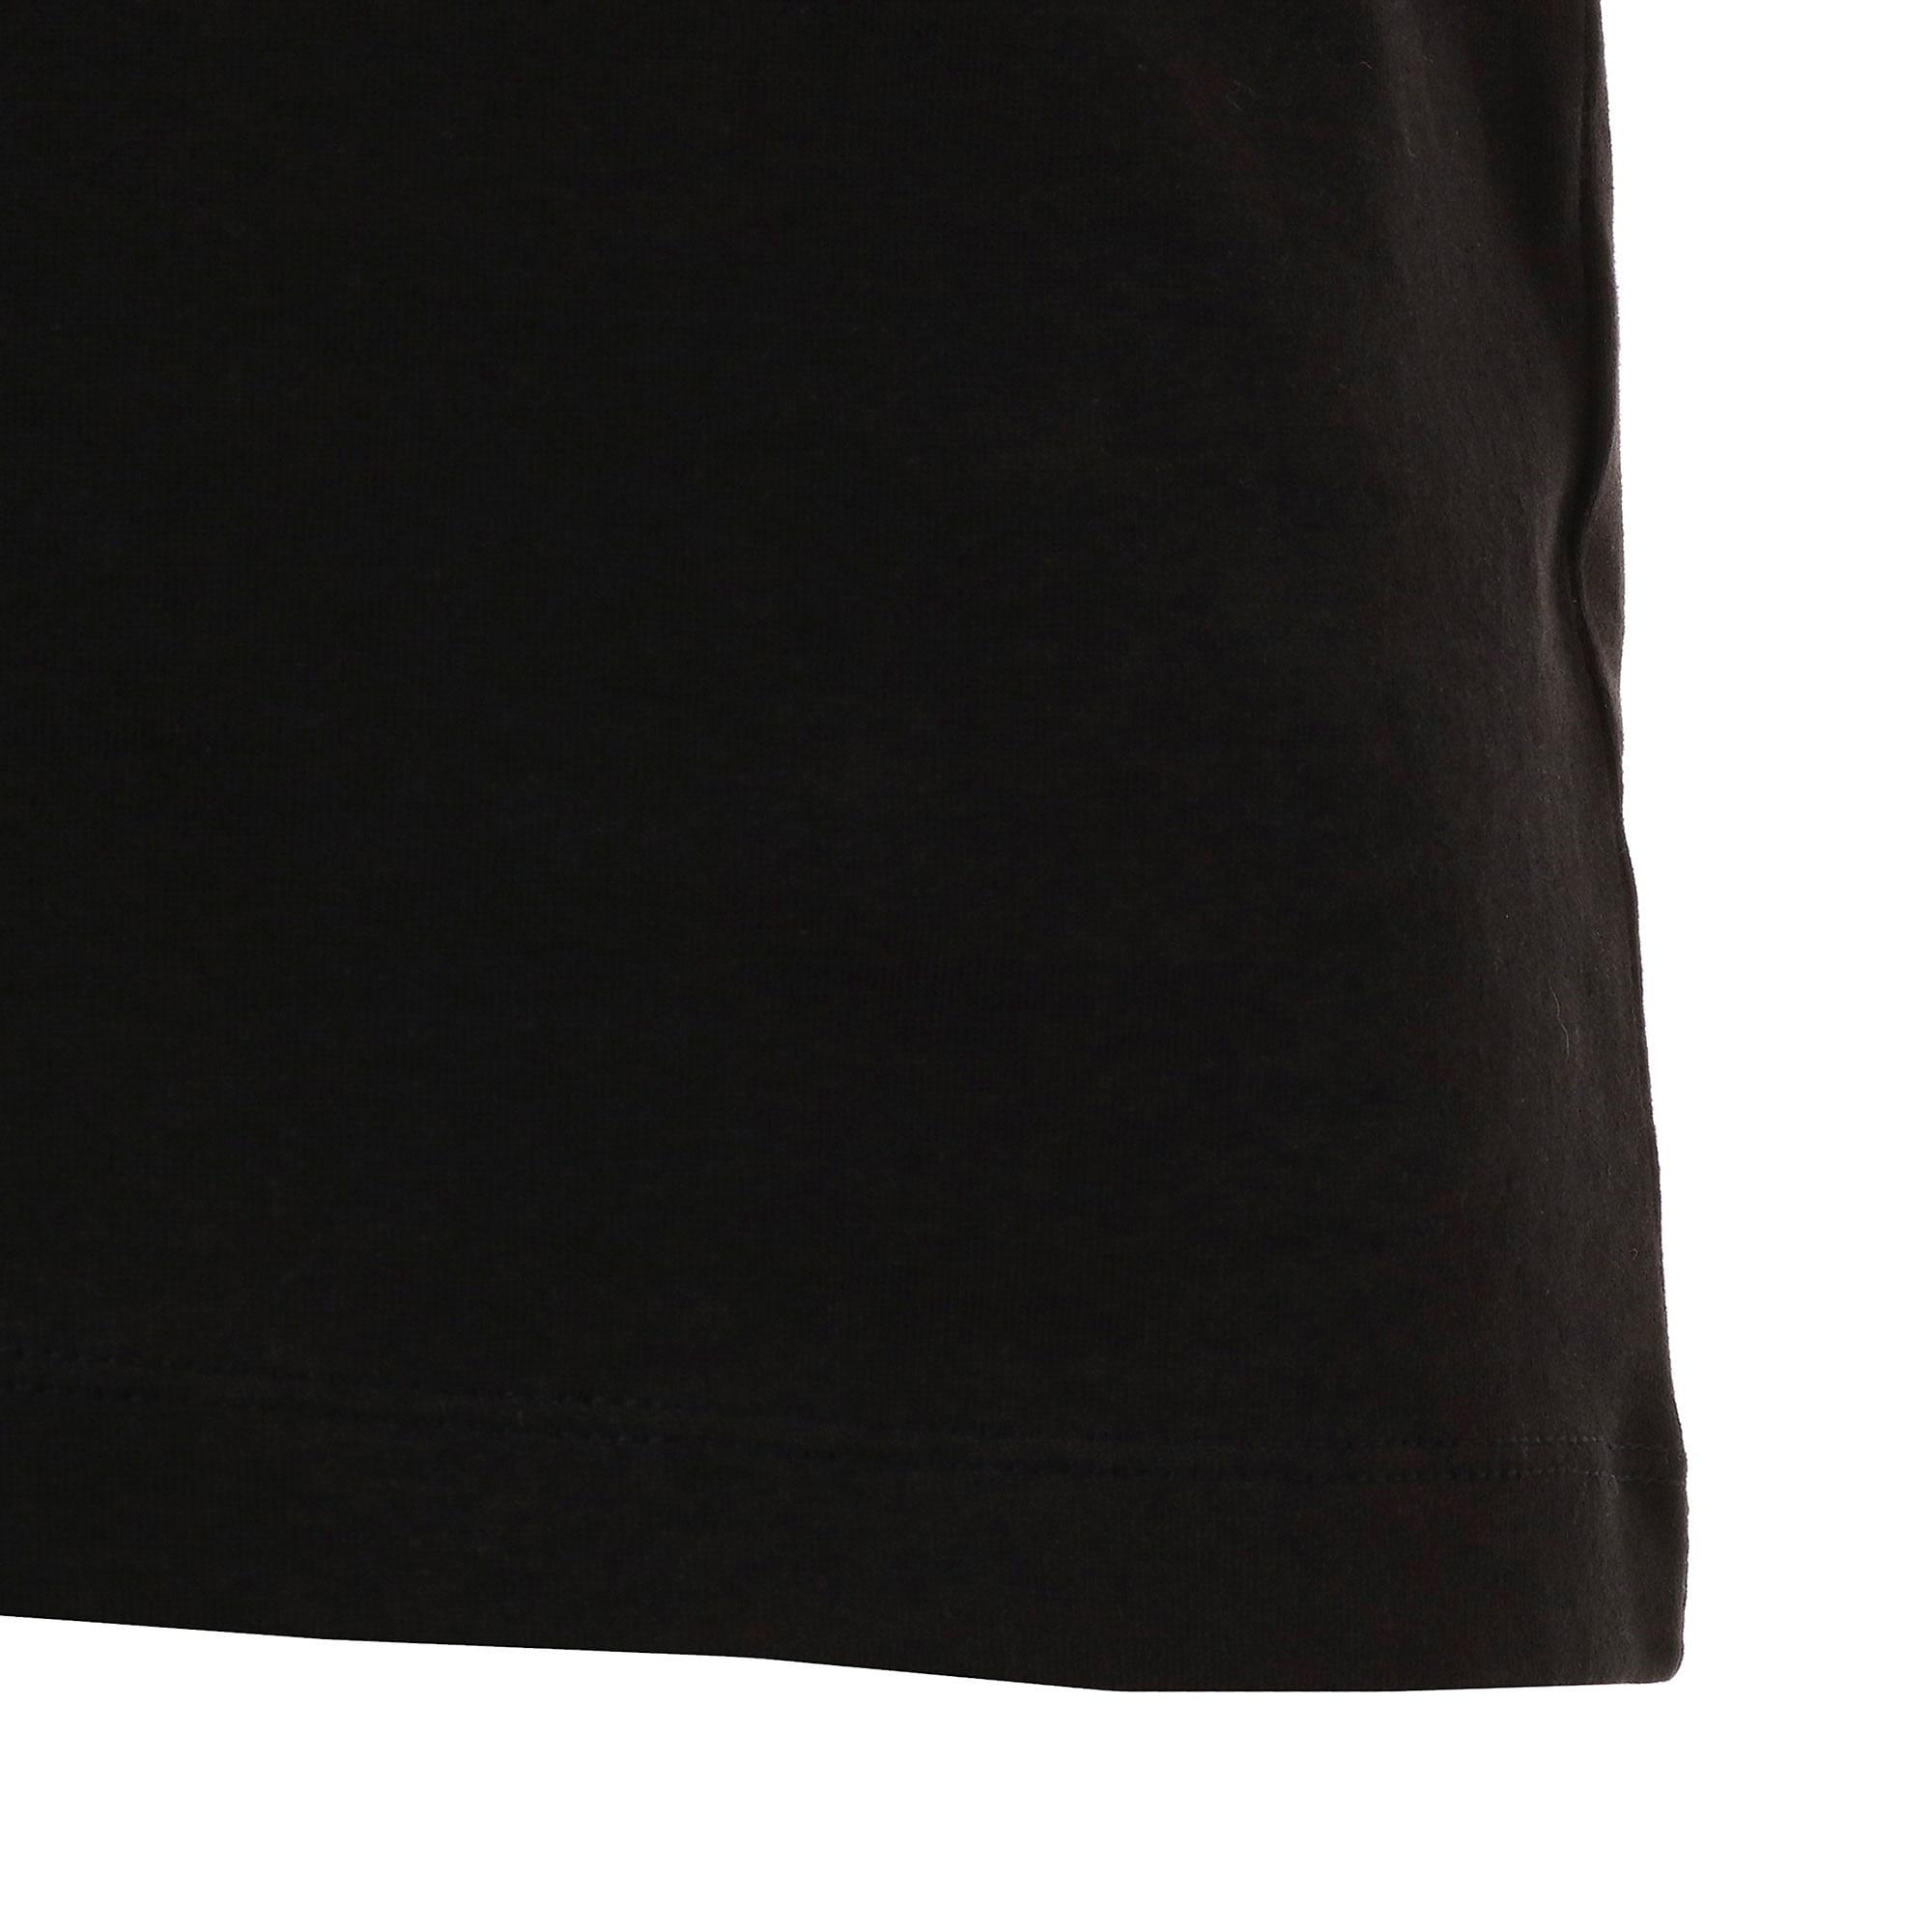 Thumbnail 9 of CLASSICS ウィメンズ ロゴ タンクトップ, Cotton Black, medium-JPN